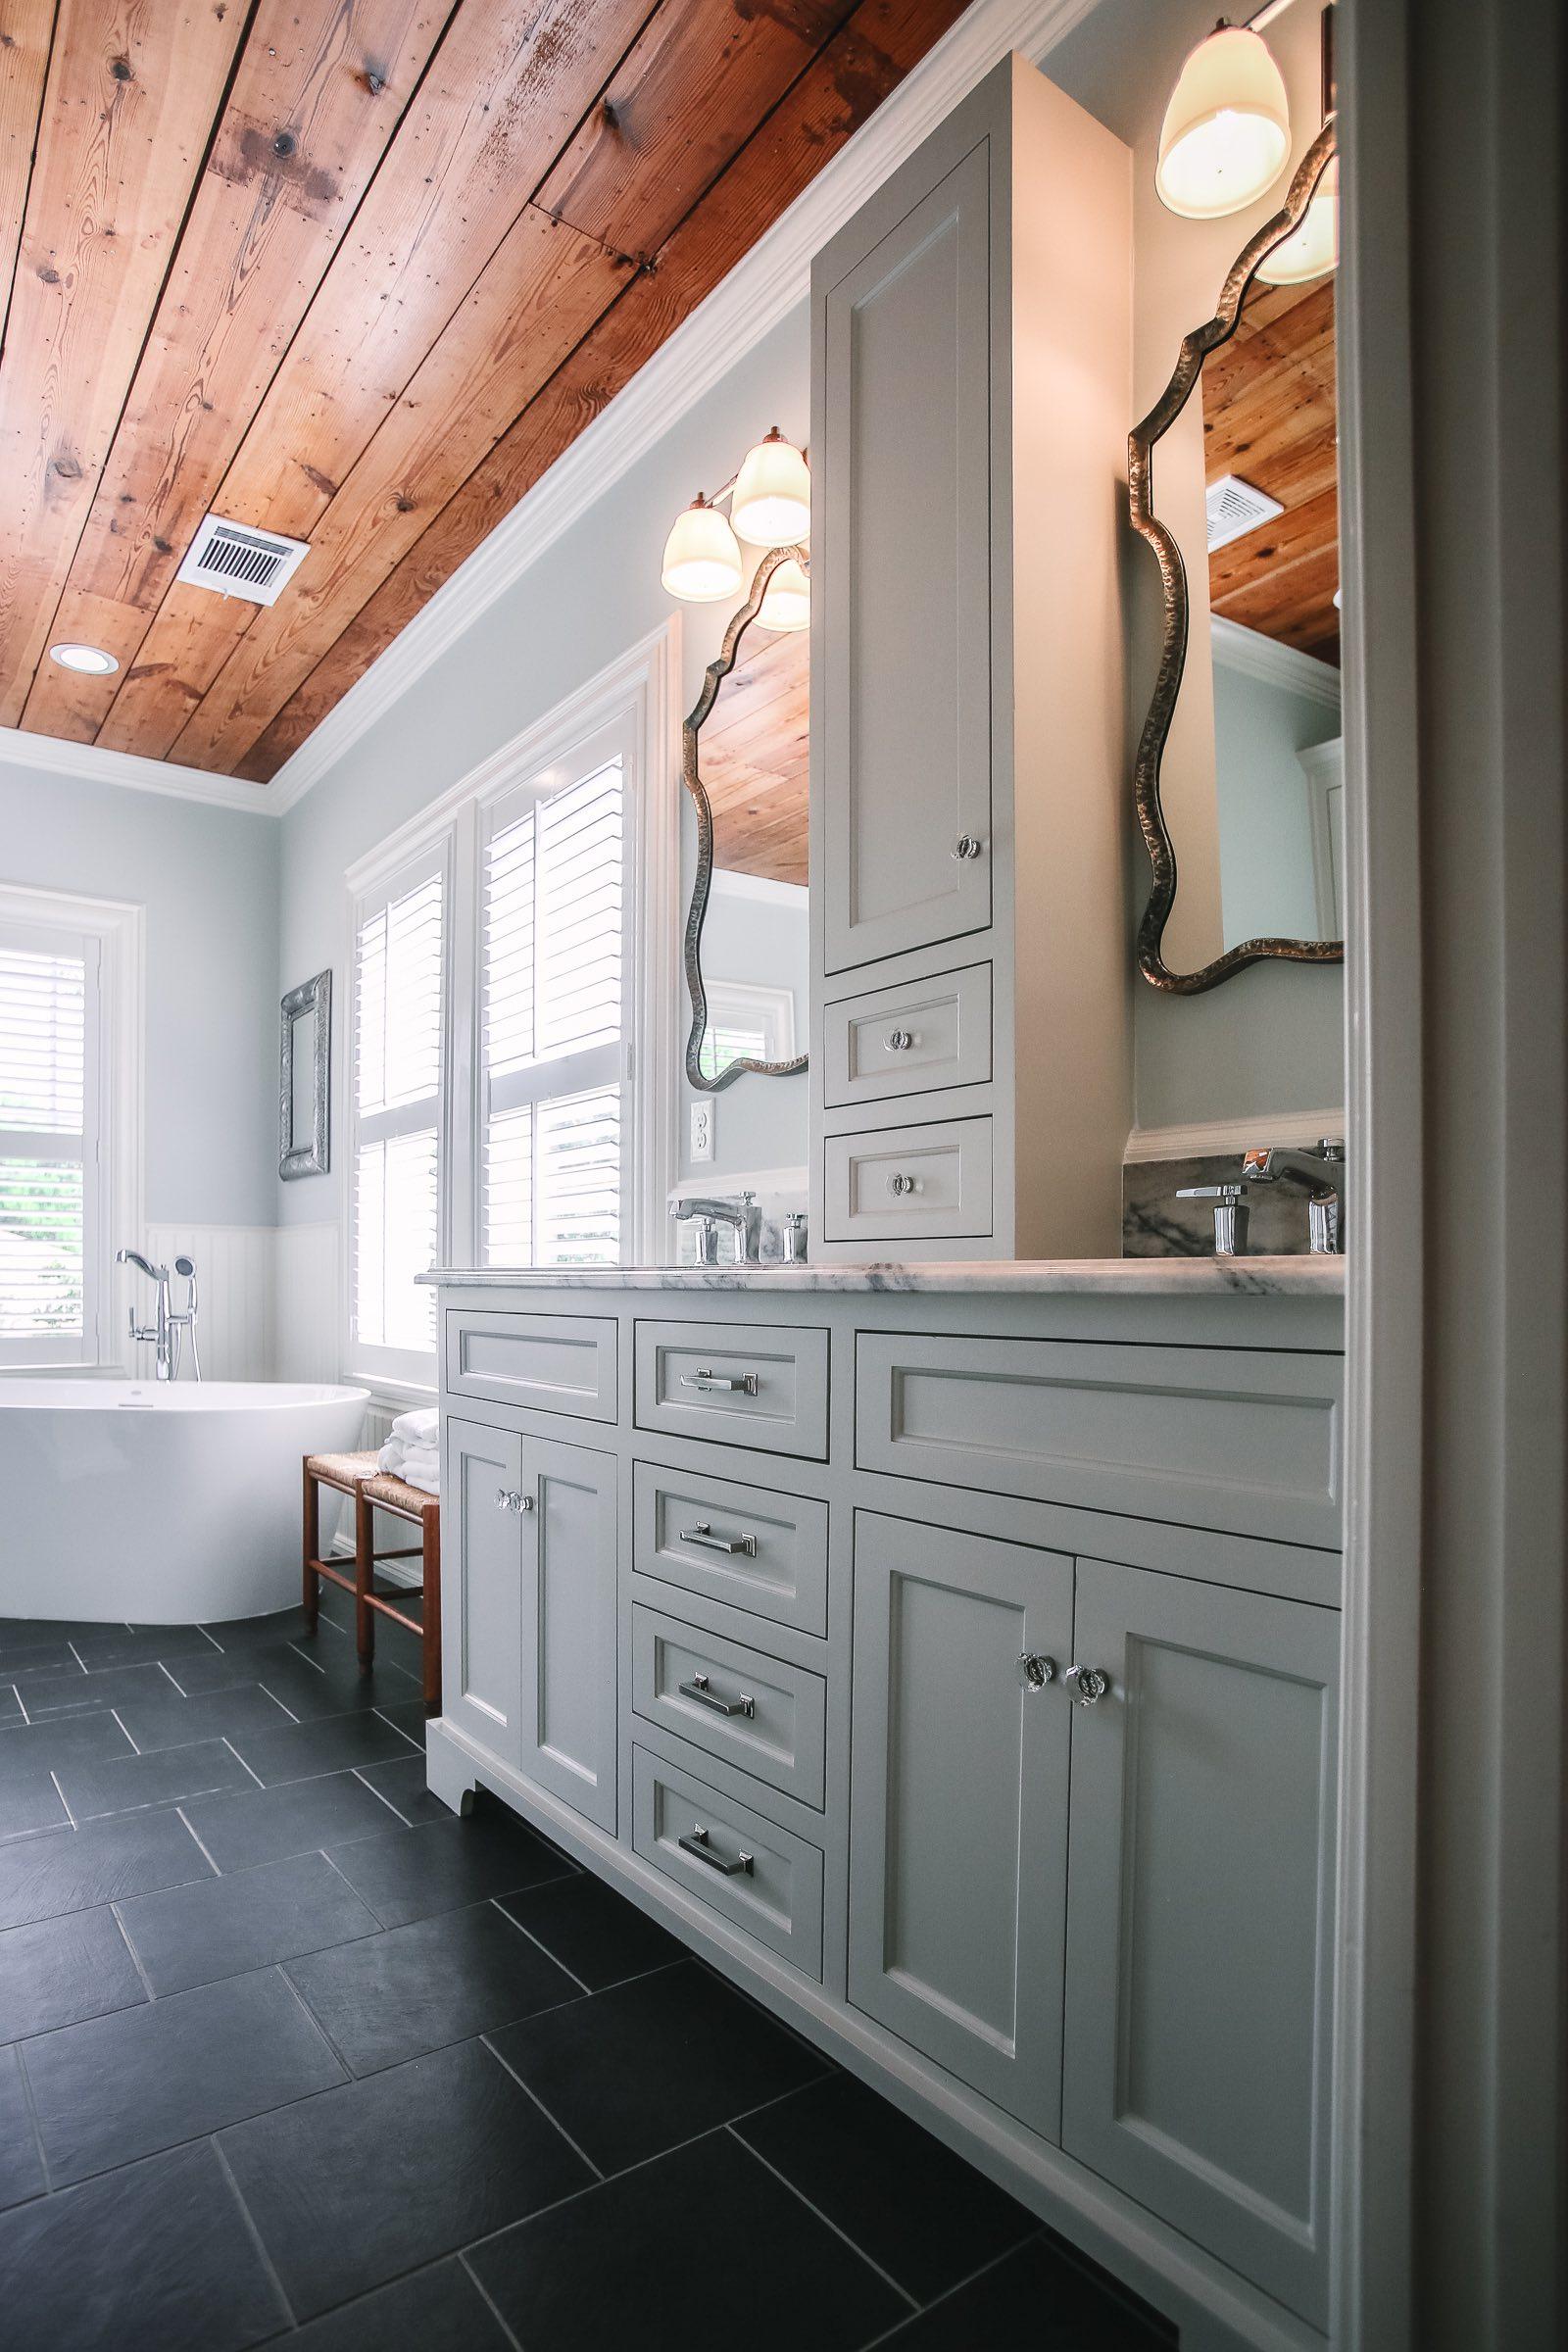 bathroom-renovation-with-shiplap-gray-cabinets.jpg